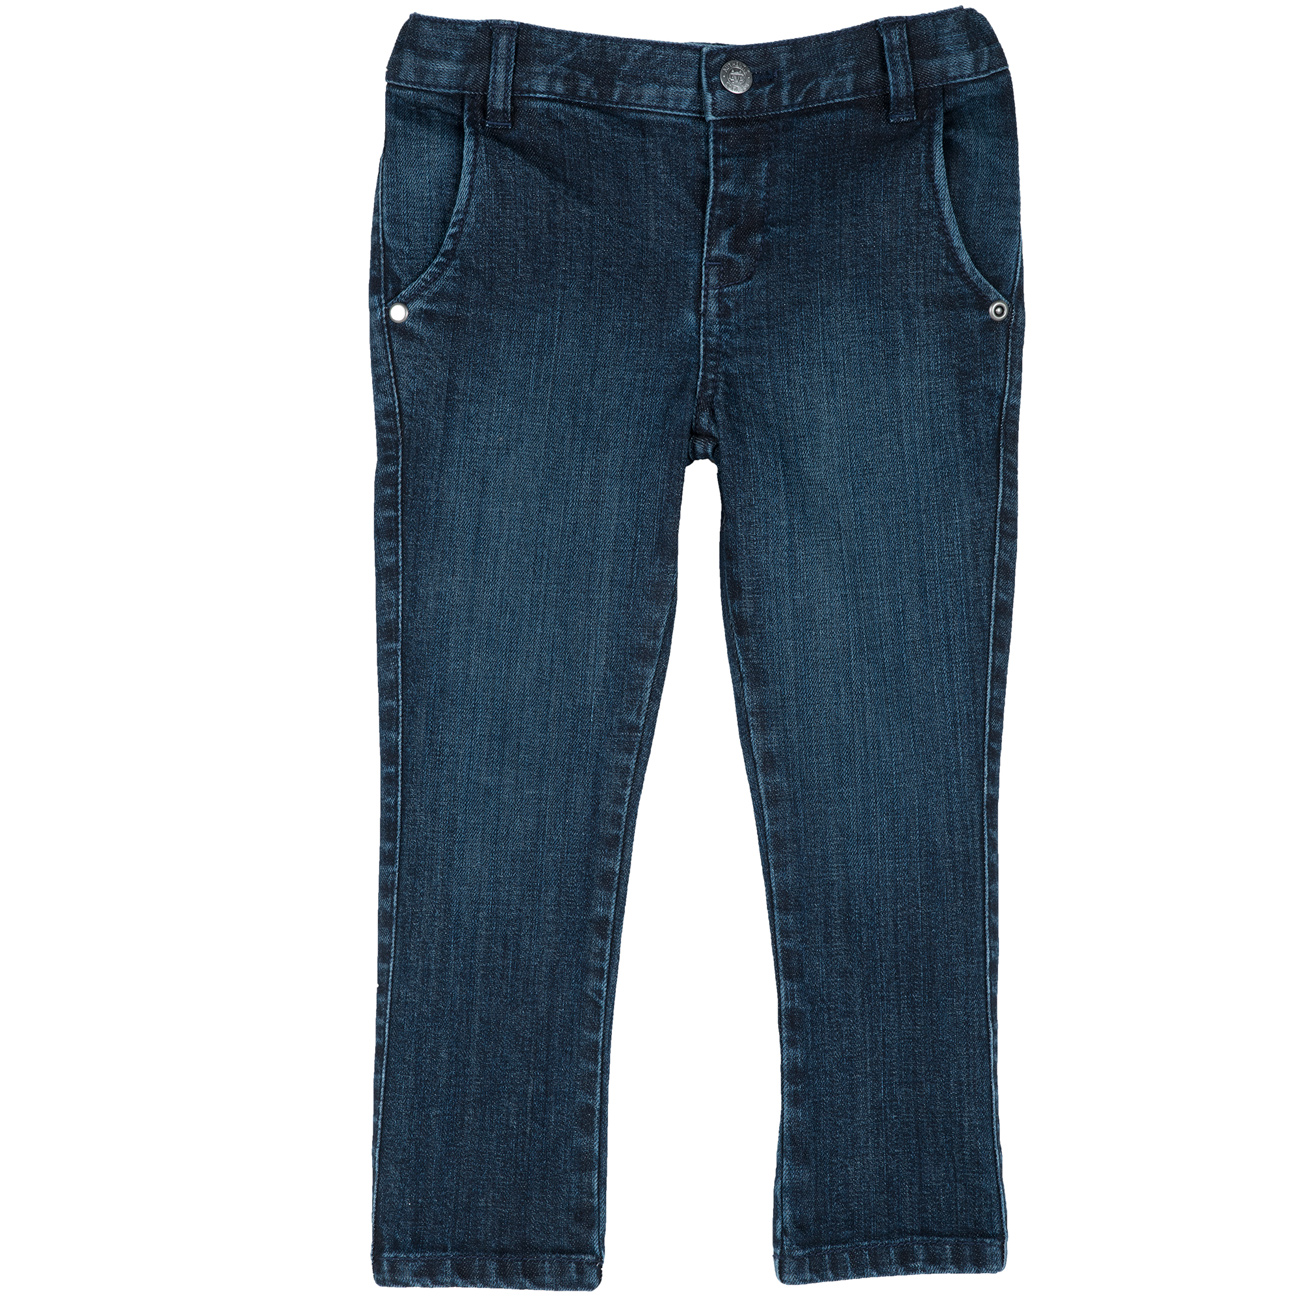 Pantaloni jeans copii Chicco albastru inchis 98